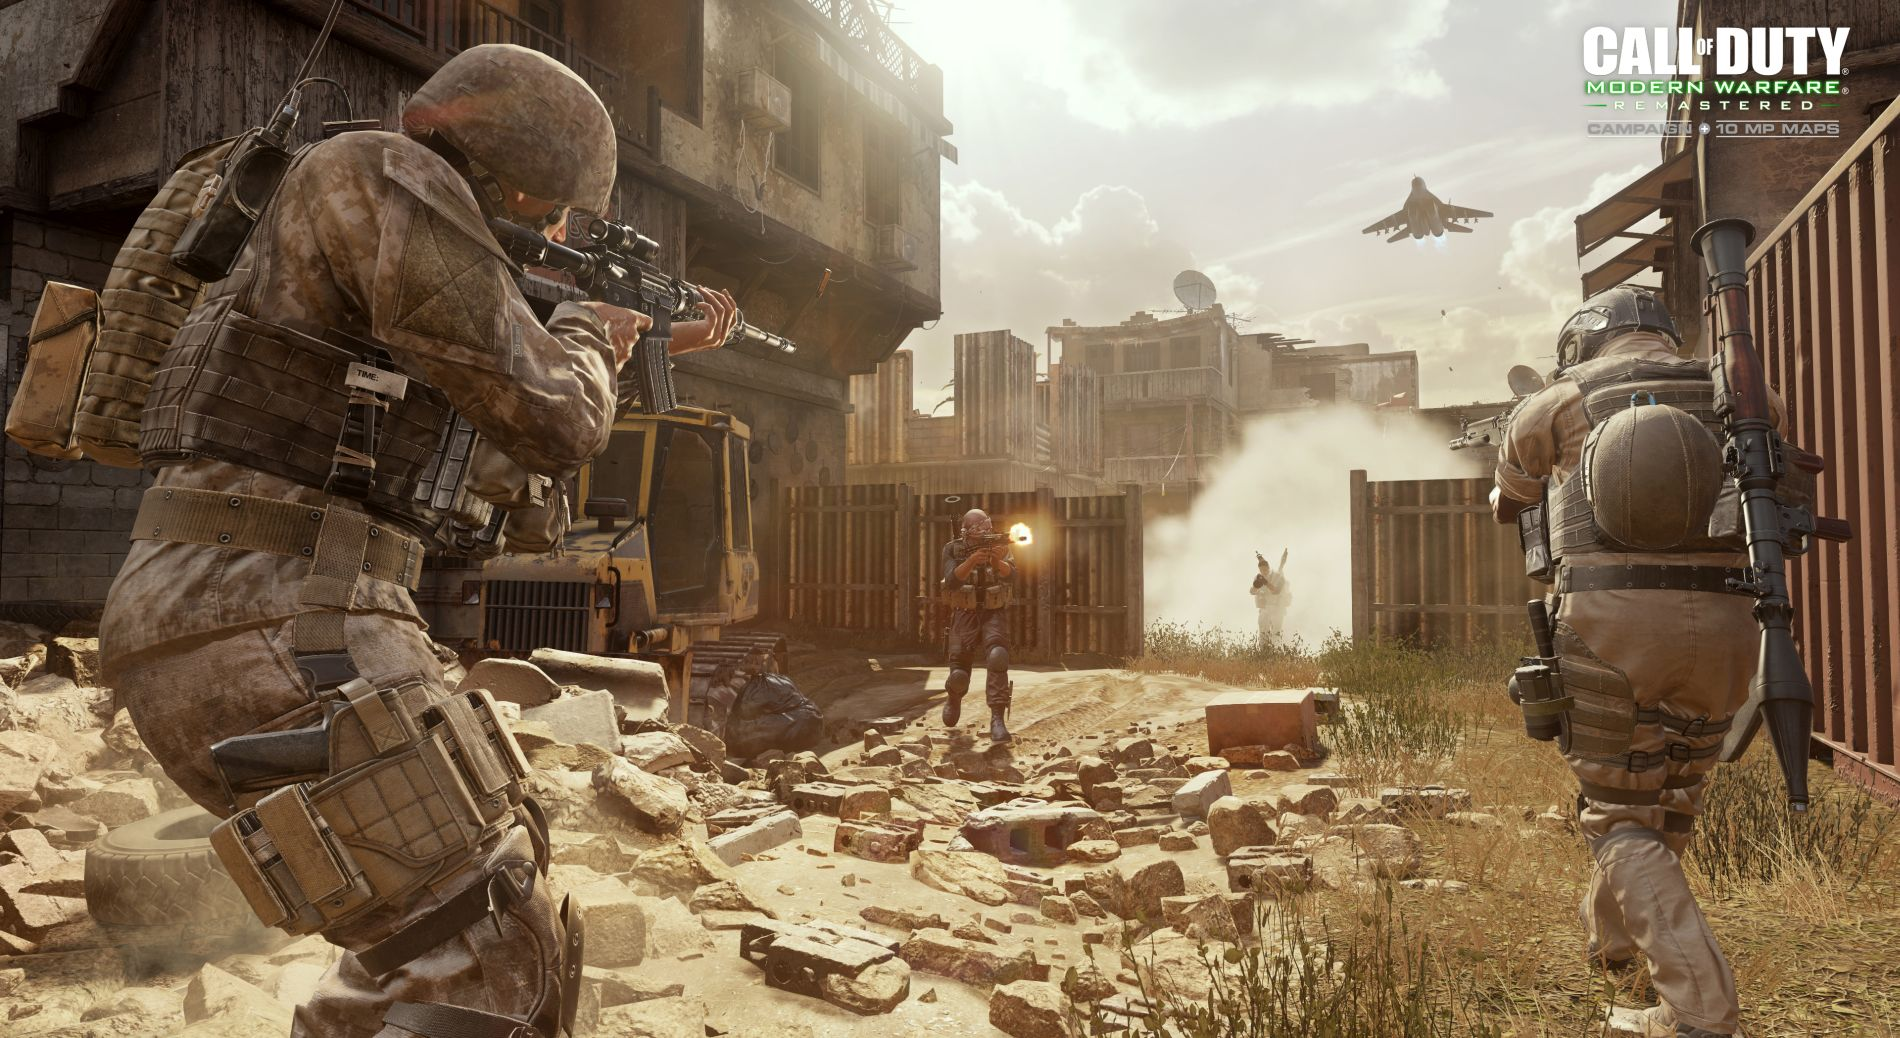 Are These Modern Warfare 3's Multiplayer Maps? | Kotaku Australia